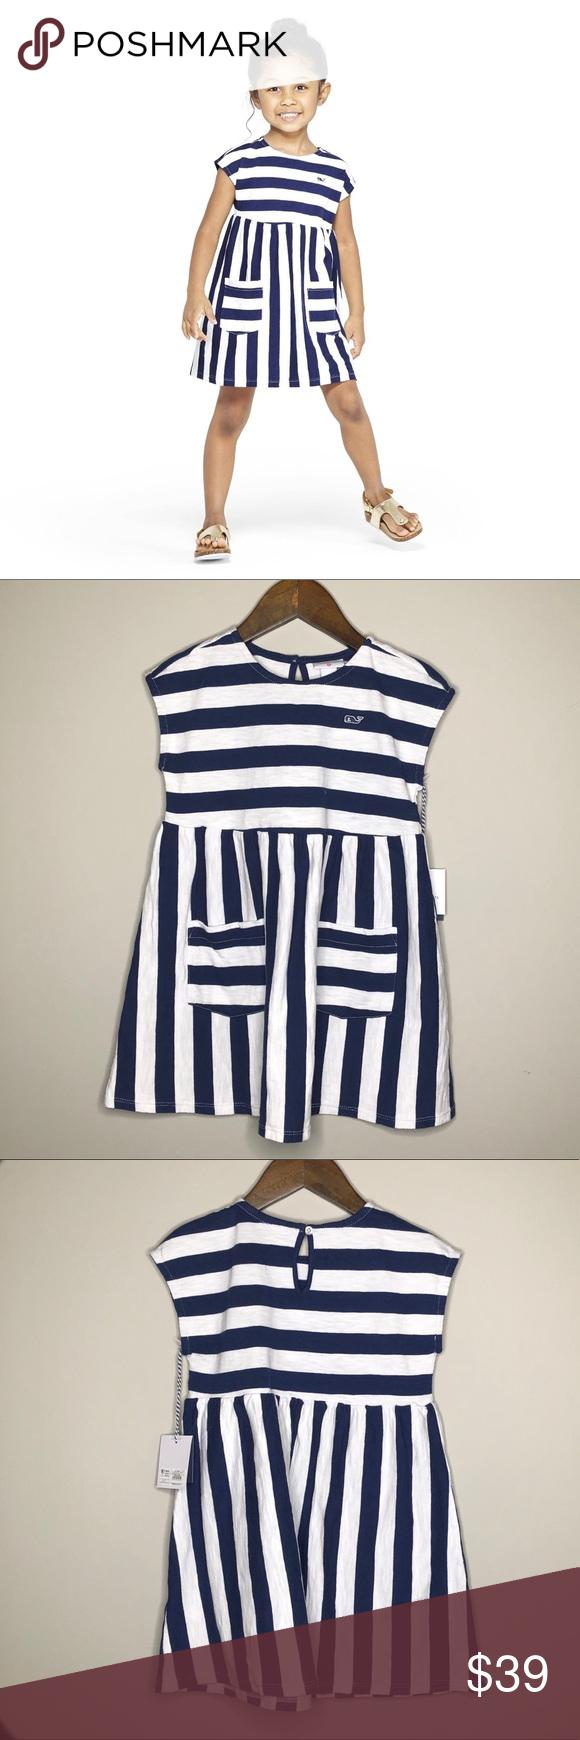 Nwt Vineyard Vines Target Striped Sleeveless Dress Striped Sleeveless Dress Casual Dresses Clothes Design [ 1740 x 580 Pixel ]